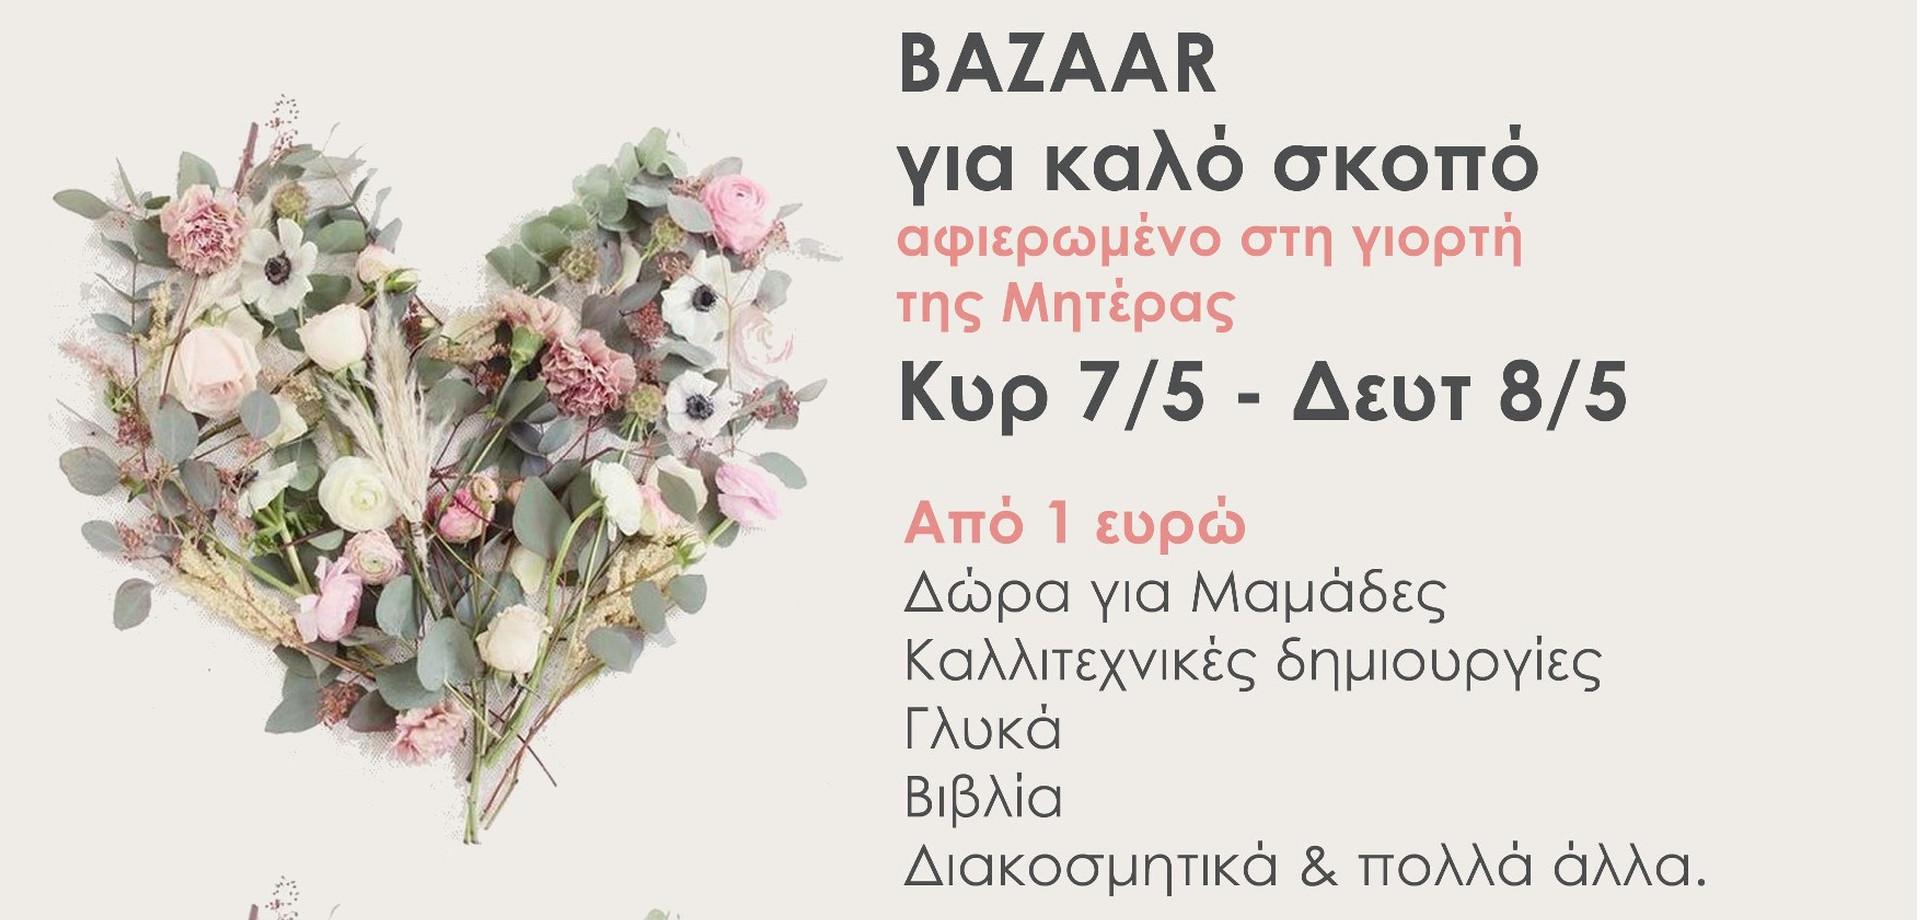 «Bazaar αφιερωμένο στη γιορτή της μητέρας» στο Πολεμικό Μουσείο - Ομάδα Εθελοντισμού Στήριξη